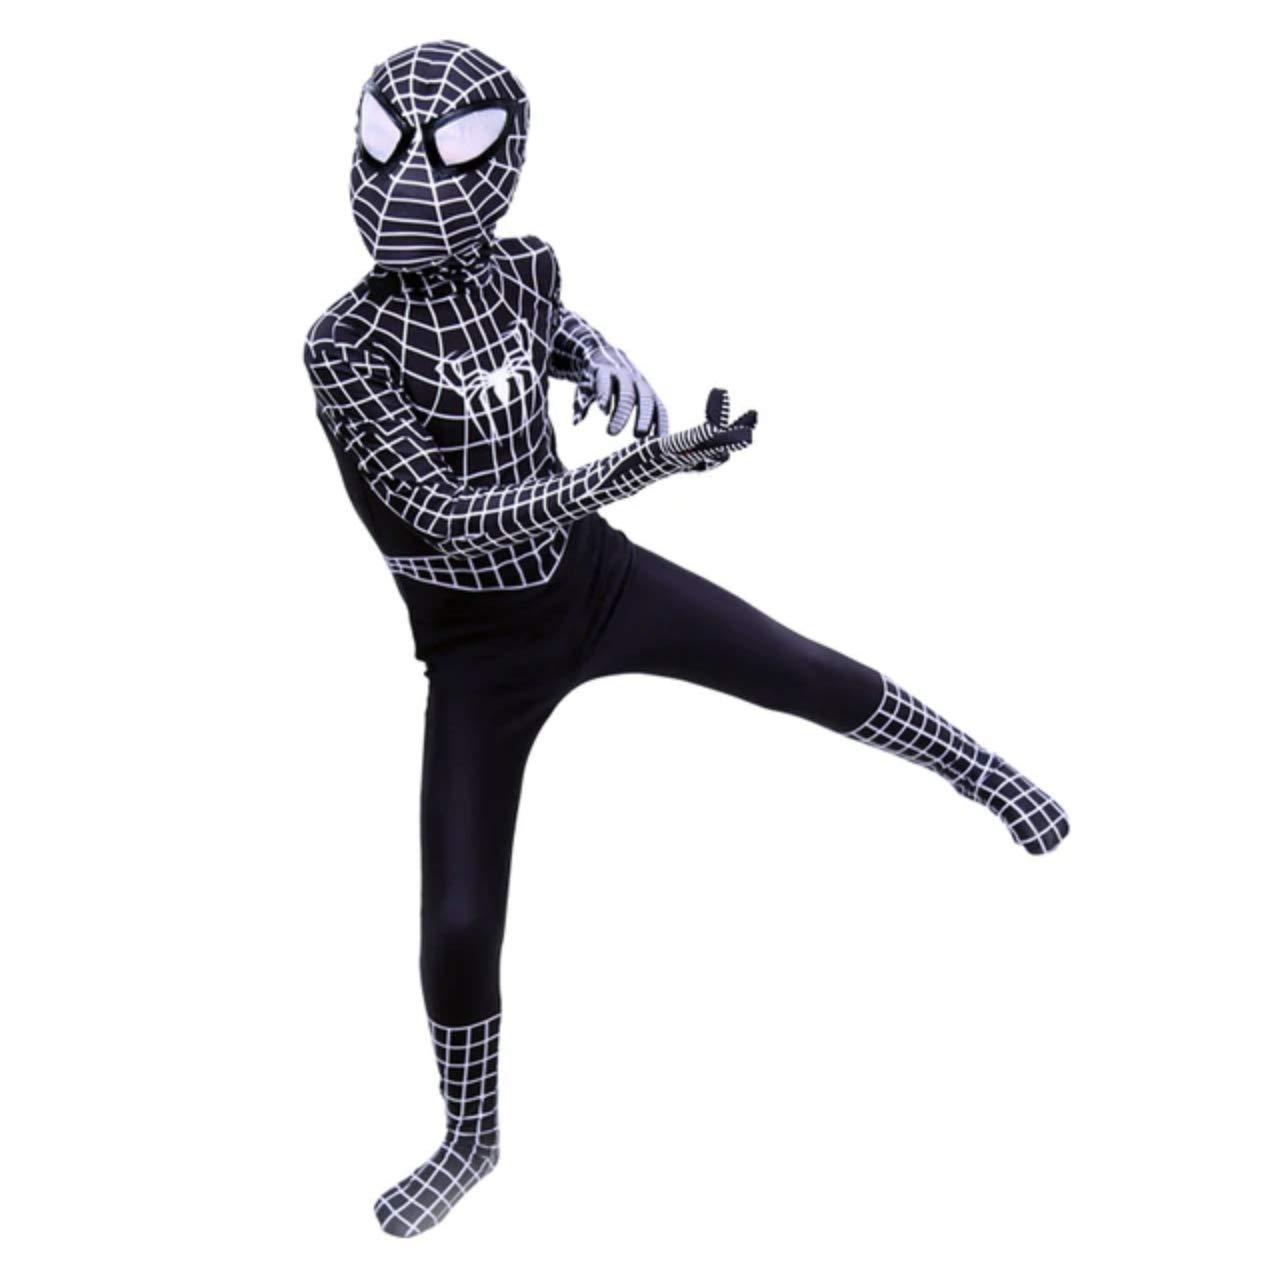 FYBR Costume de Spider-Man Superskin pour Enfant Unisexe Gar/çons et Filles Combinaison Cosplay Animal Zentai V/êtements Halloween Lycra Spandex